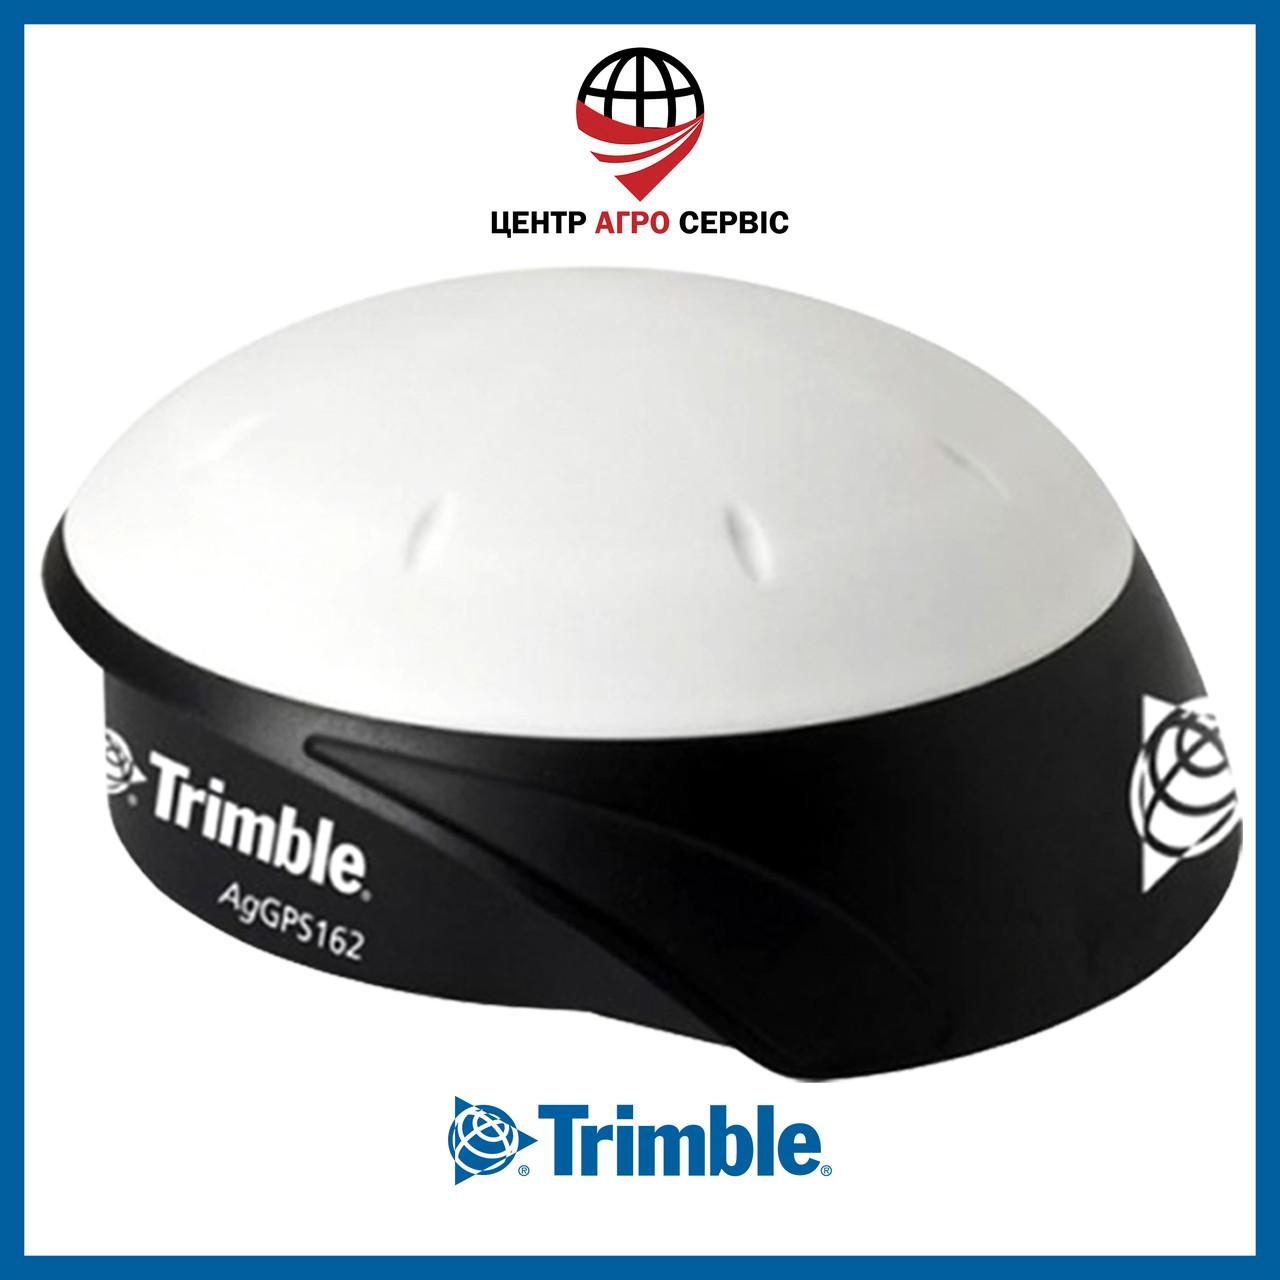 GPS приемник (антенна) Trimble AgGPS 162 (L1)